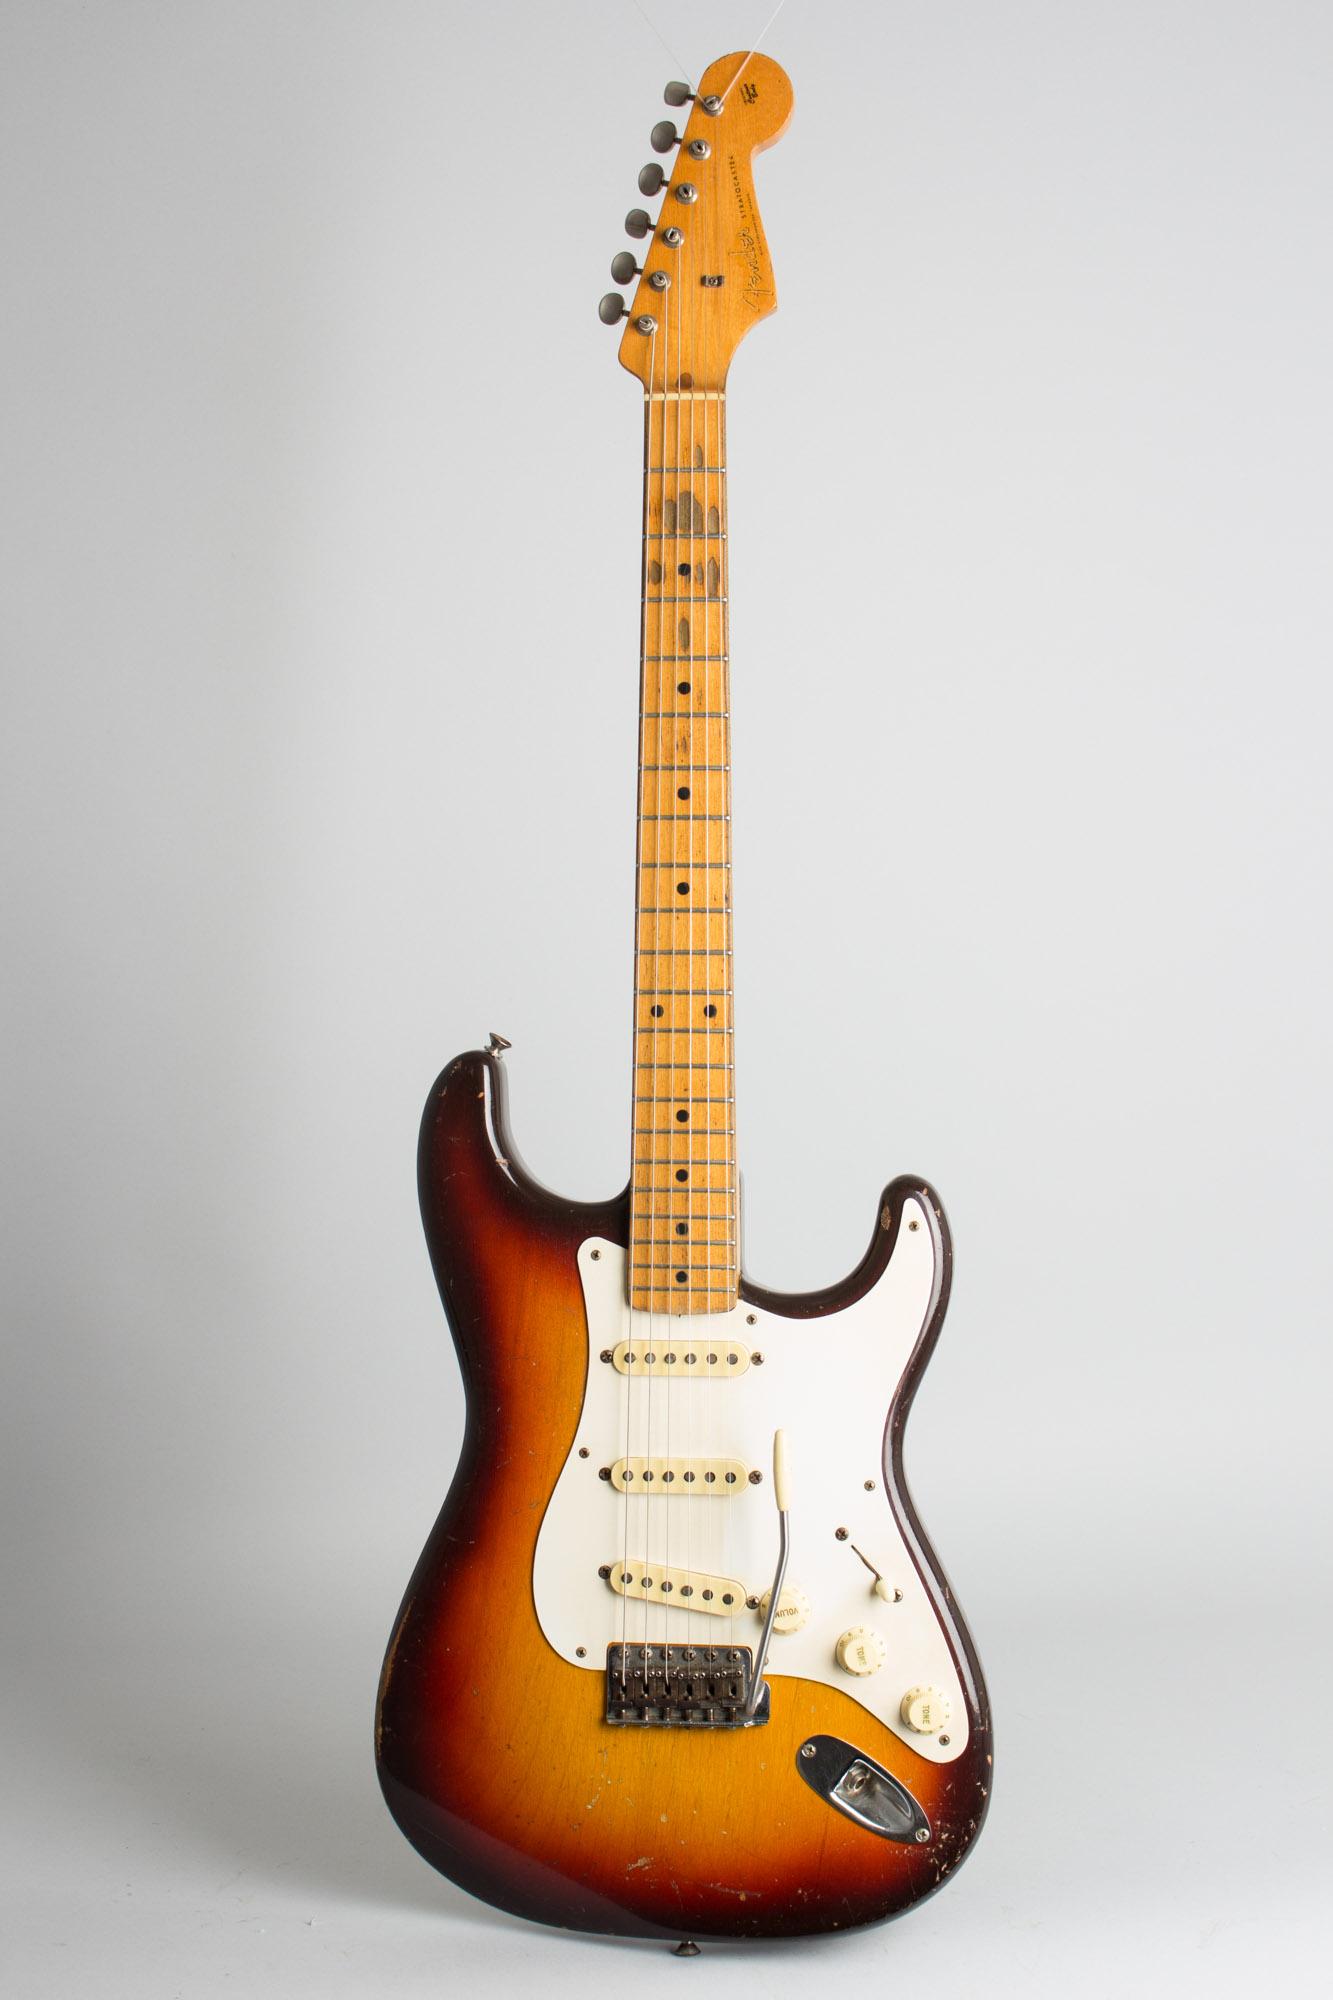 RetroFret Vintage Guitars